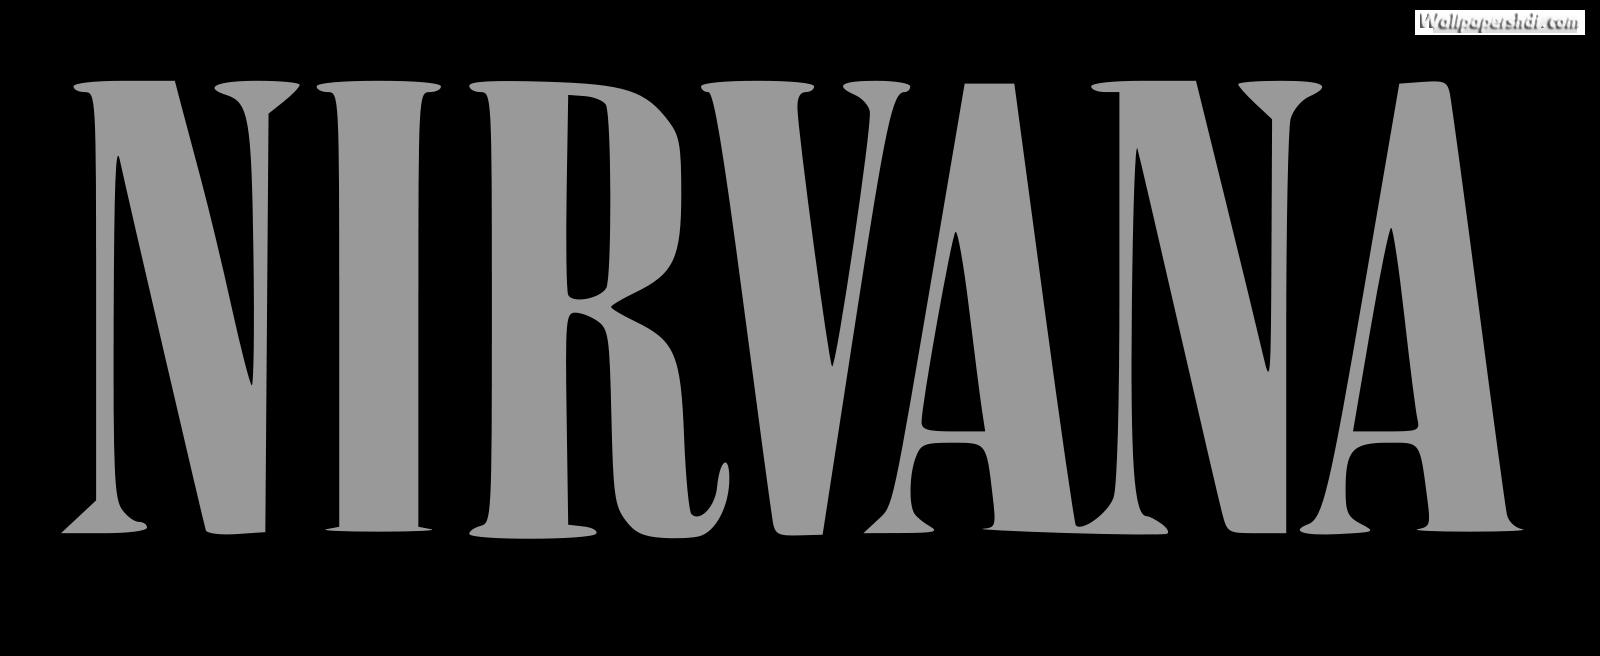 Nirvana Logo Wallpaper Hd Images 3 HD Wallpapers aduphoto 1600x656